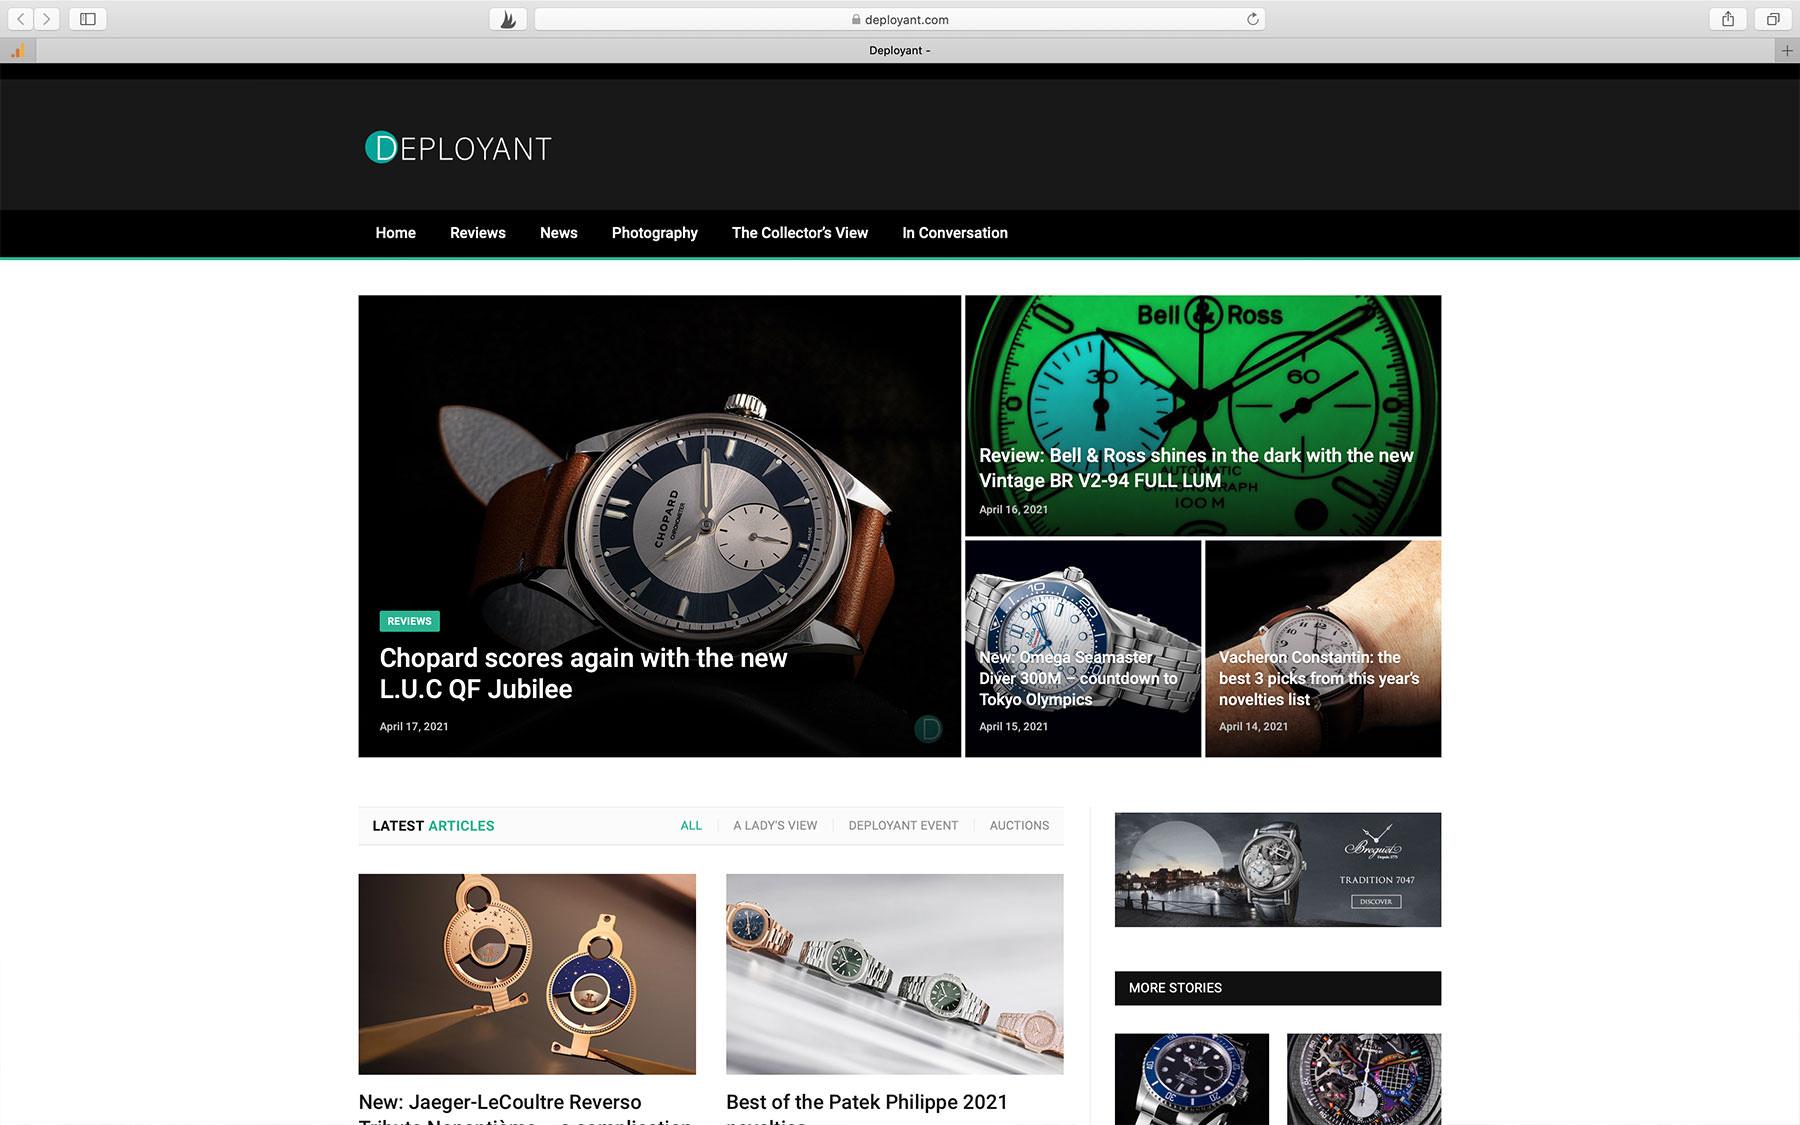 Watch Blogs deployant